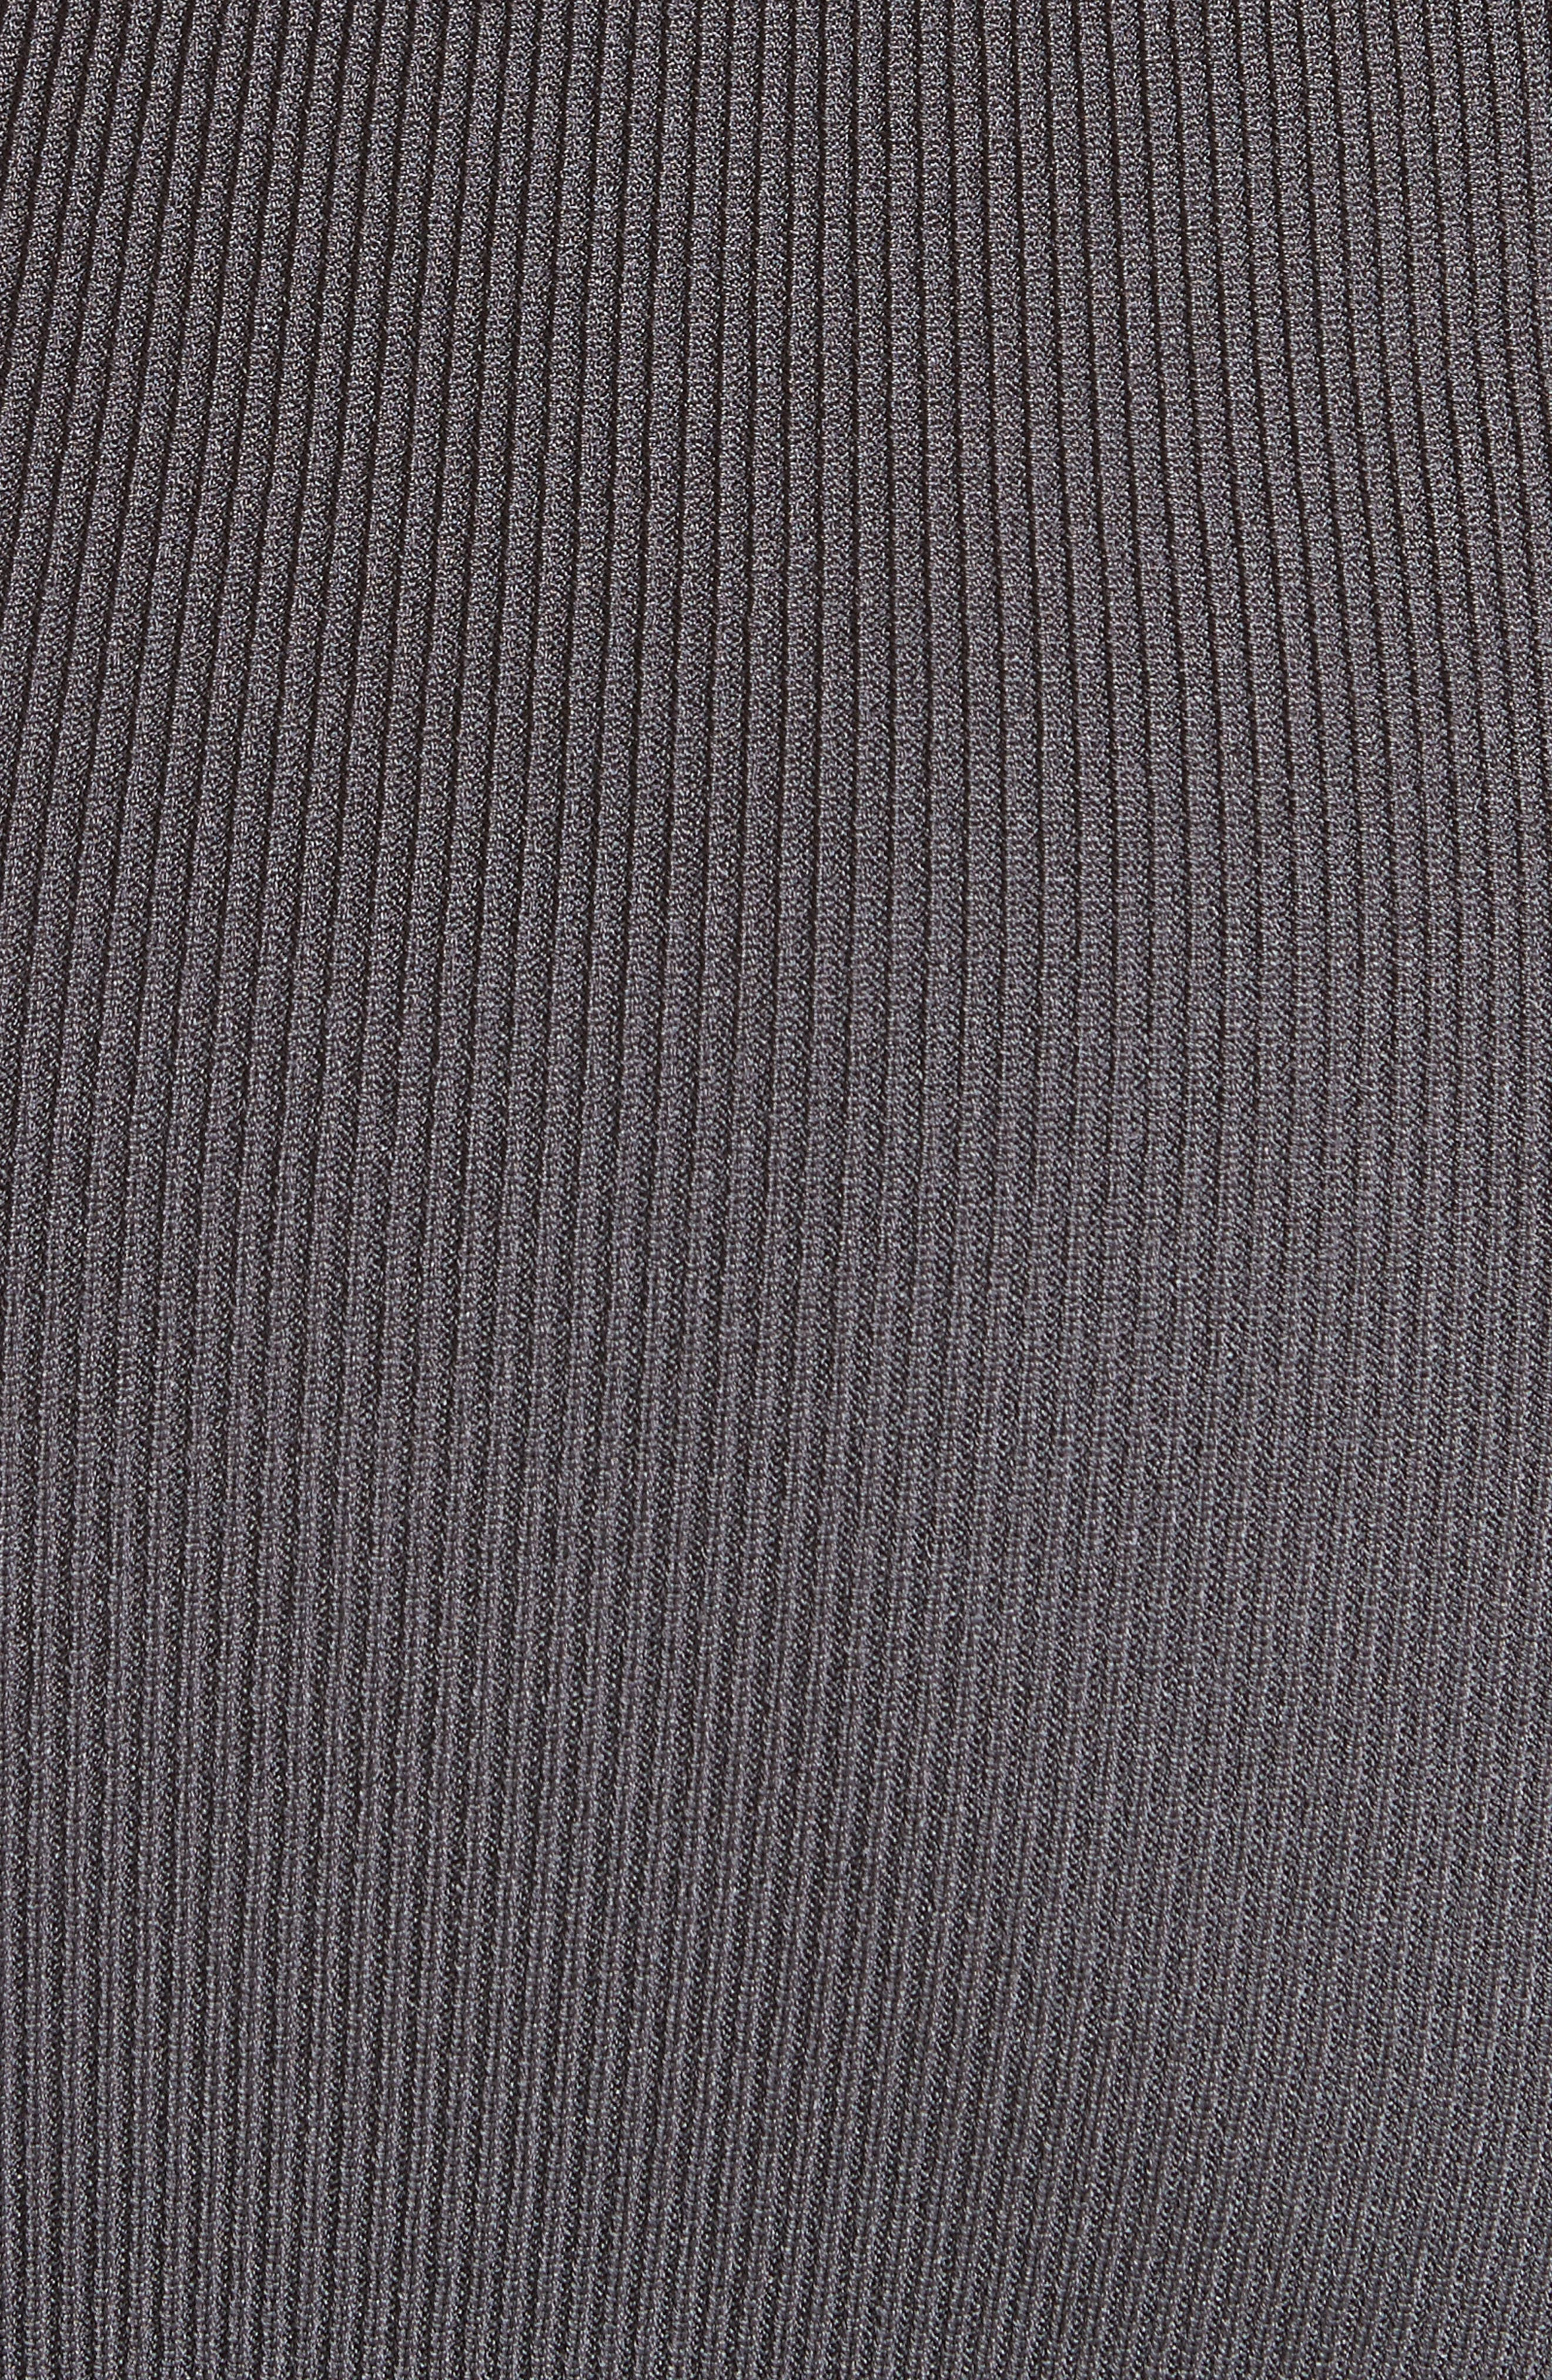 Alsia Cutout Knit Dress,                             Alternate thumbnail 6, color,                             028